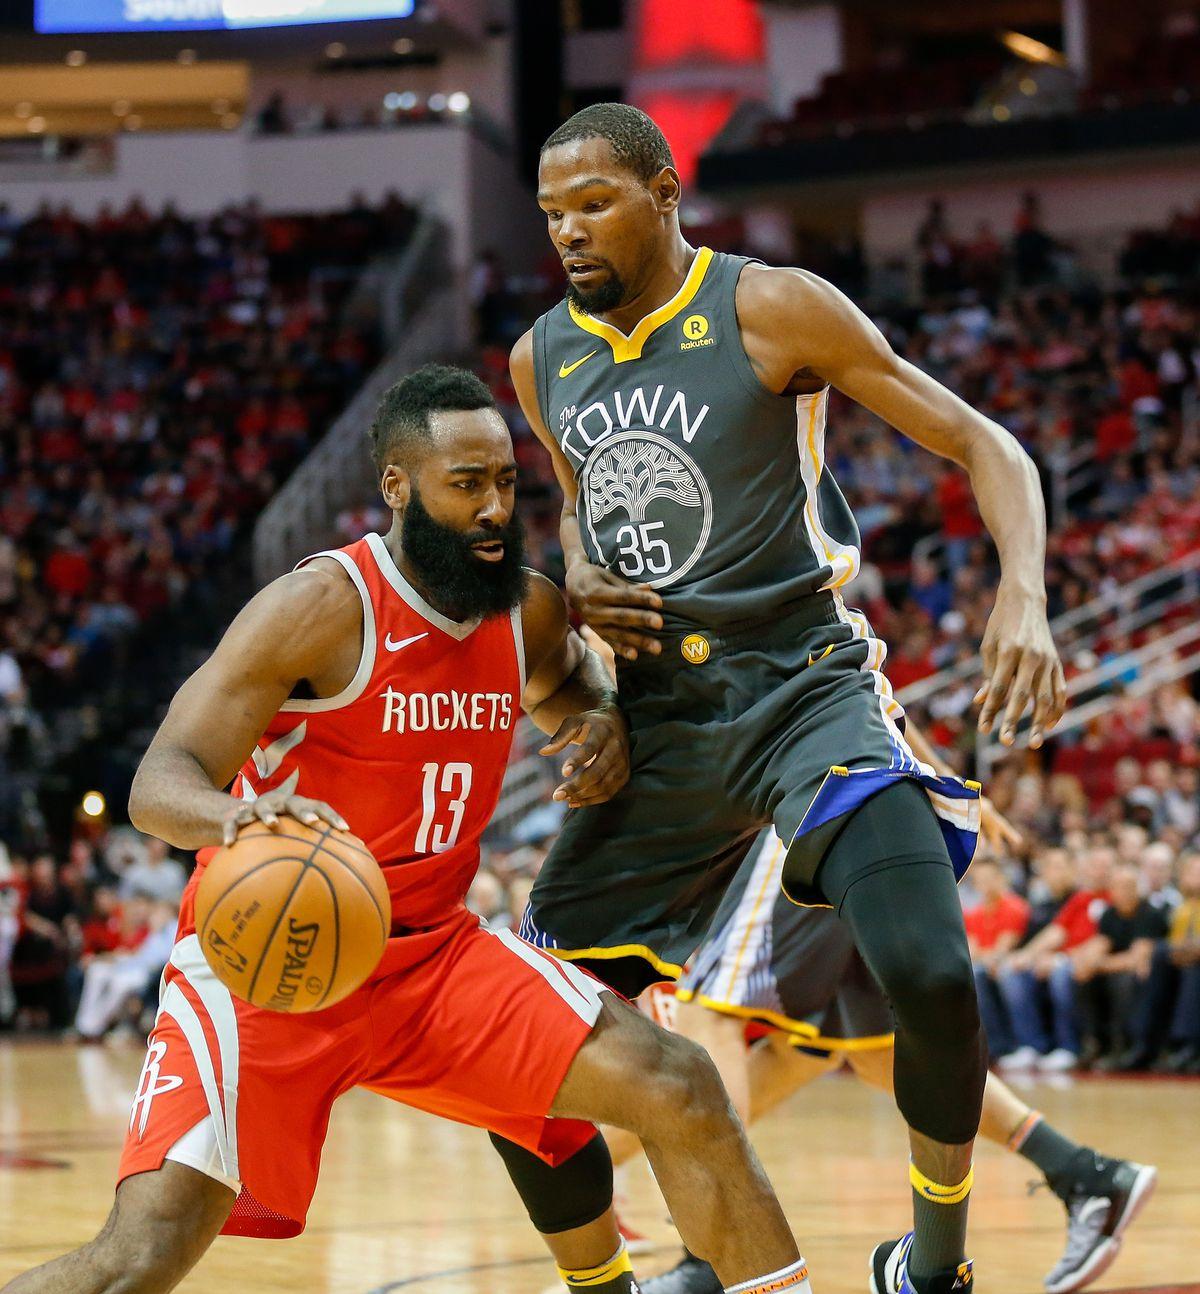 Warriors Vs Rockets Lineup: Team Steph Vs. Team LeBron: Position By Position Breakdown